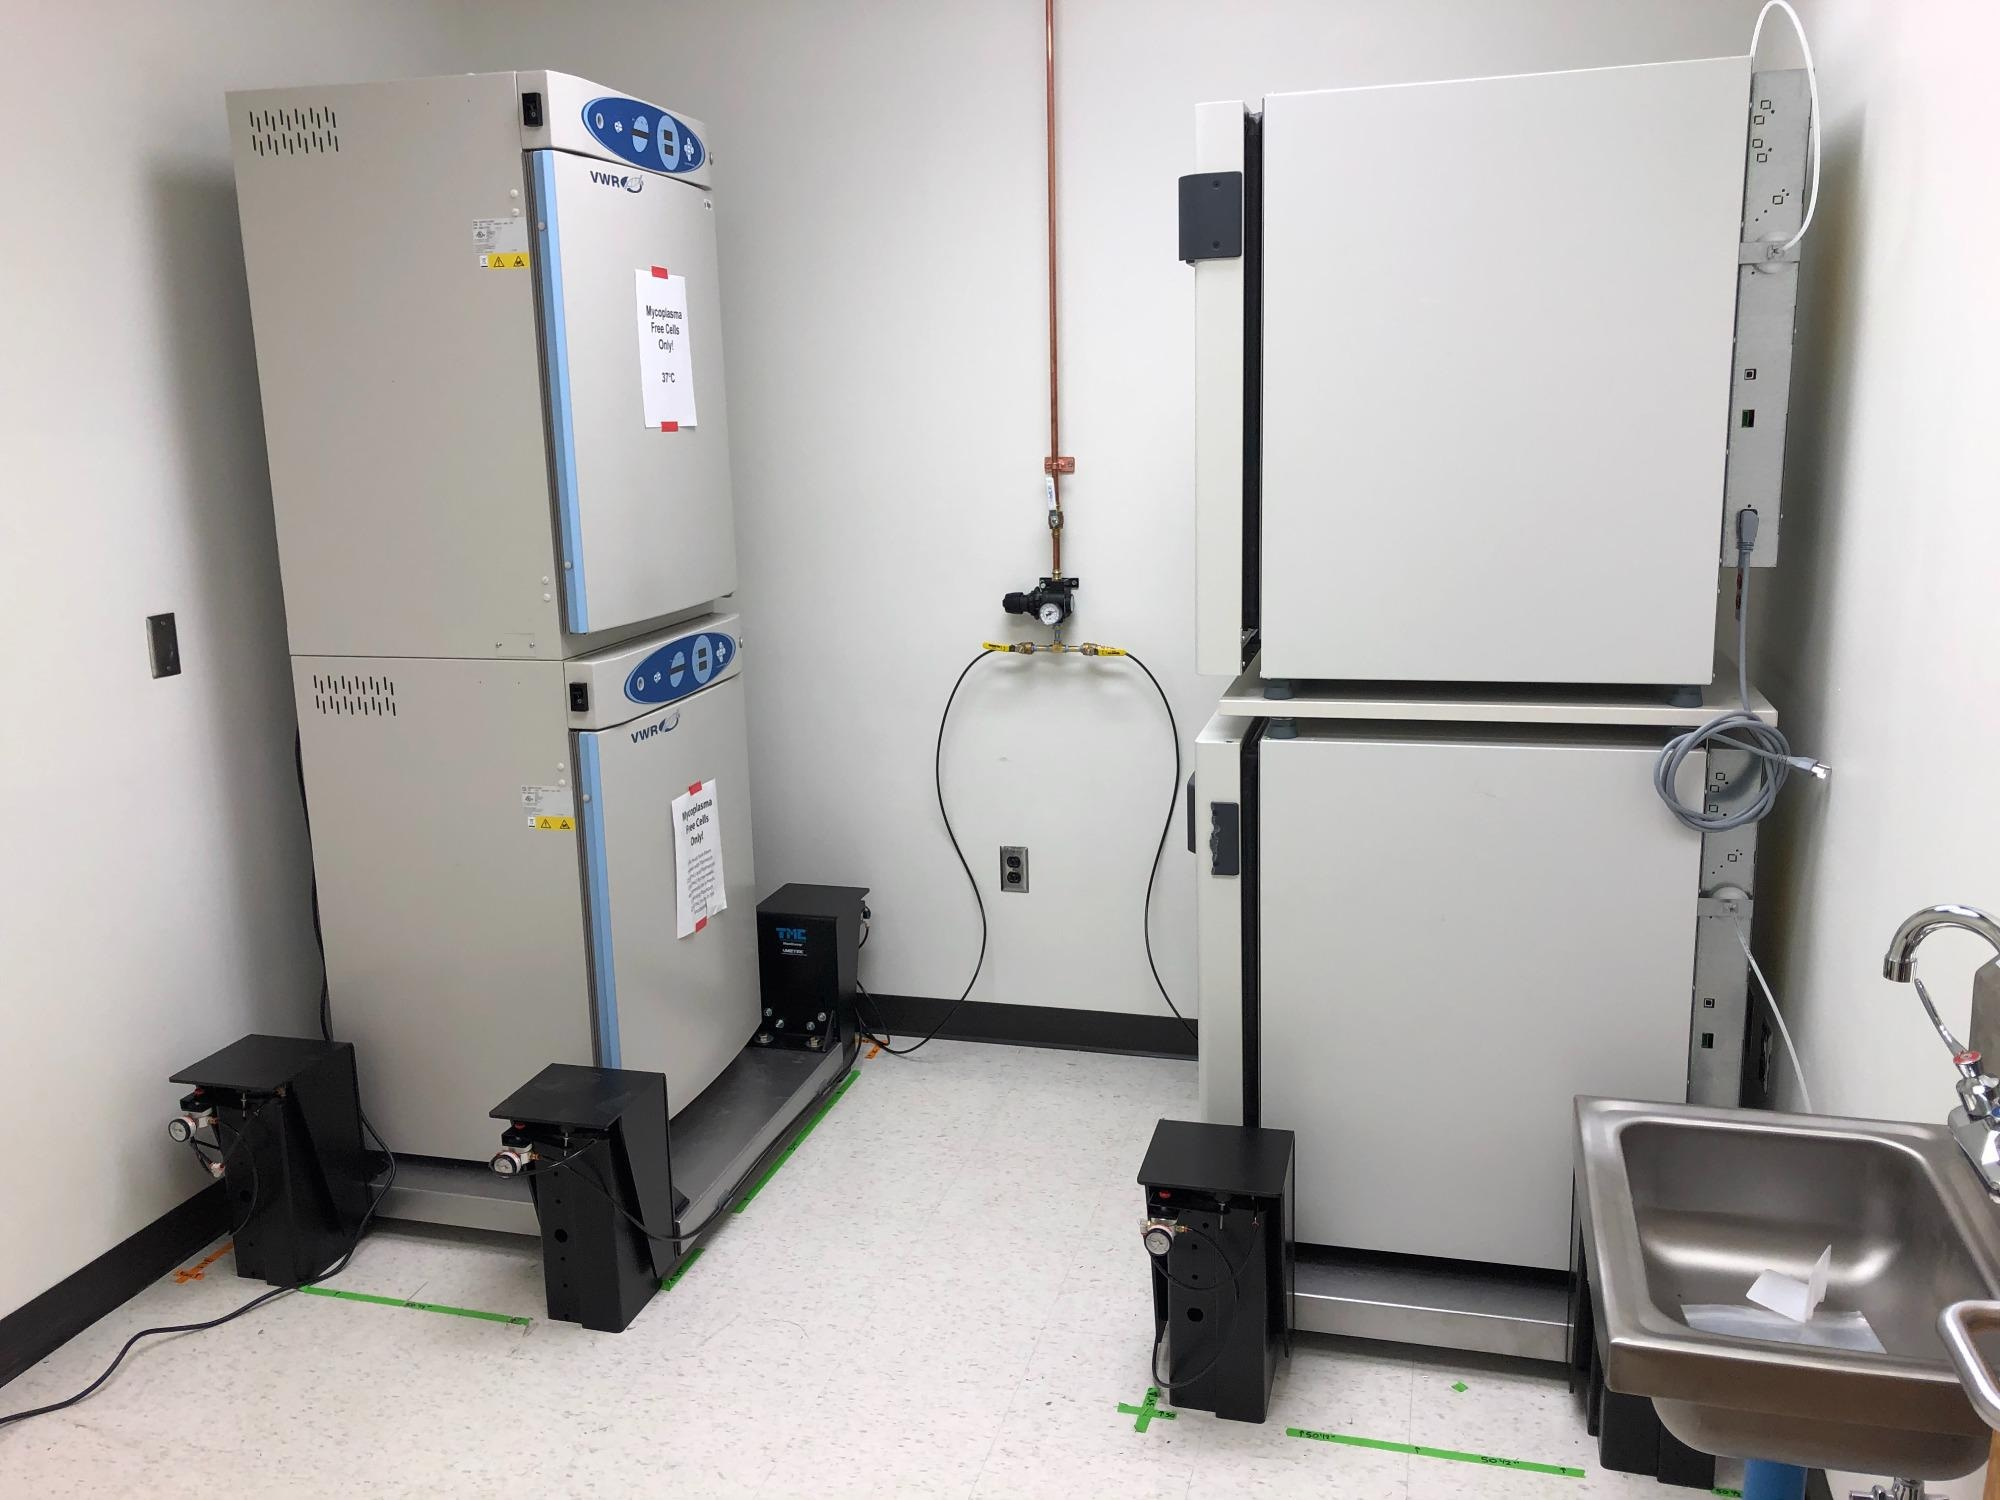 Incubators stacked on TMC MaxDamp vibration isolation platforms.